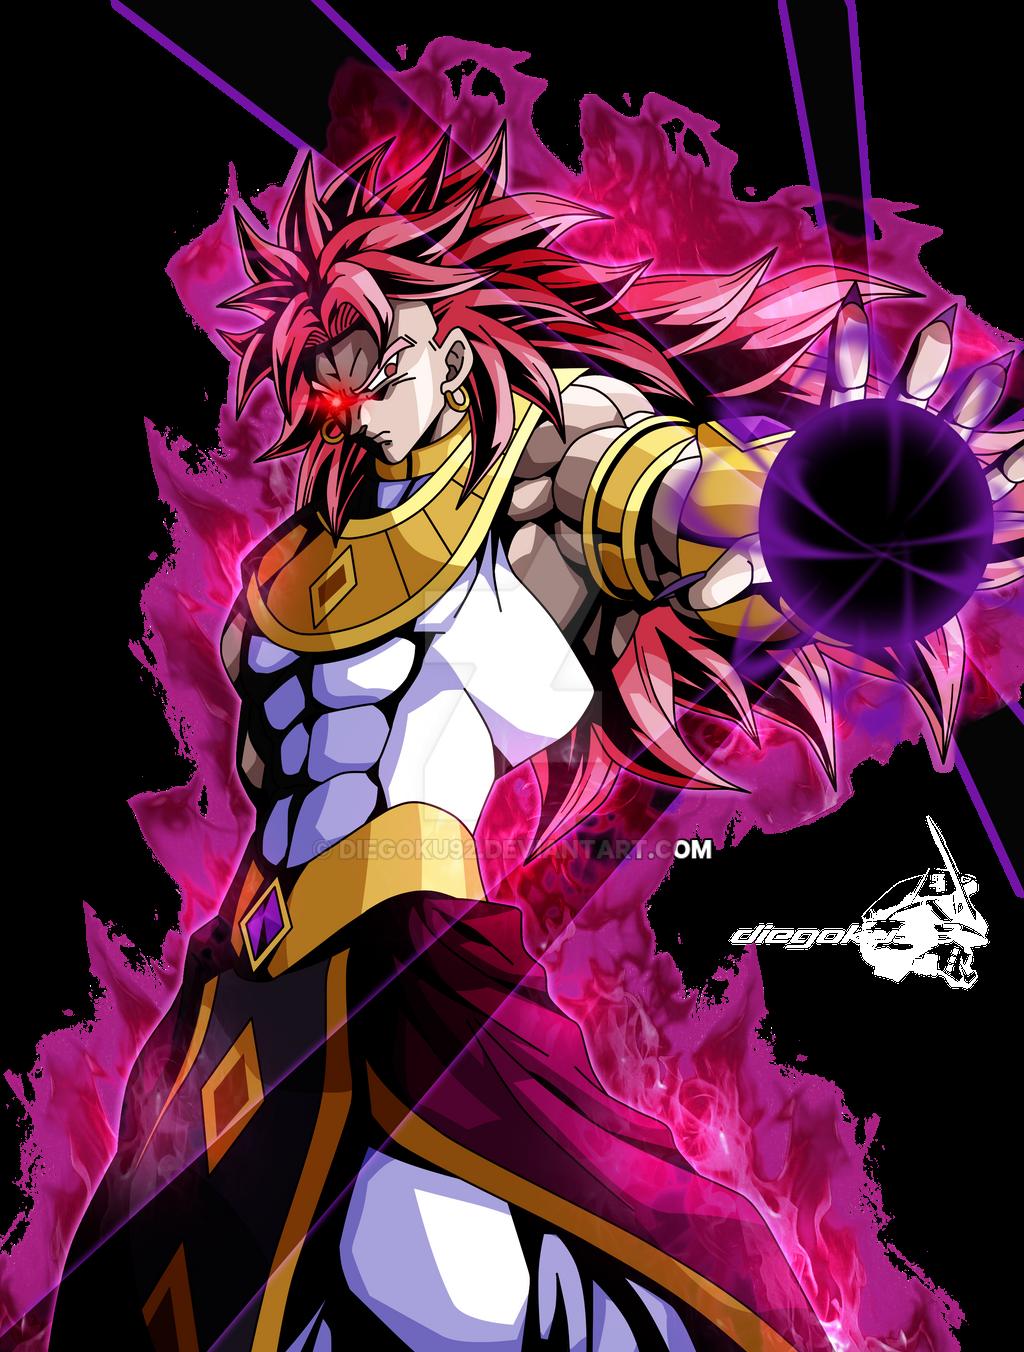 Dragon ball z super saiyan god gohan